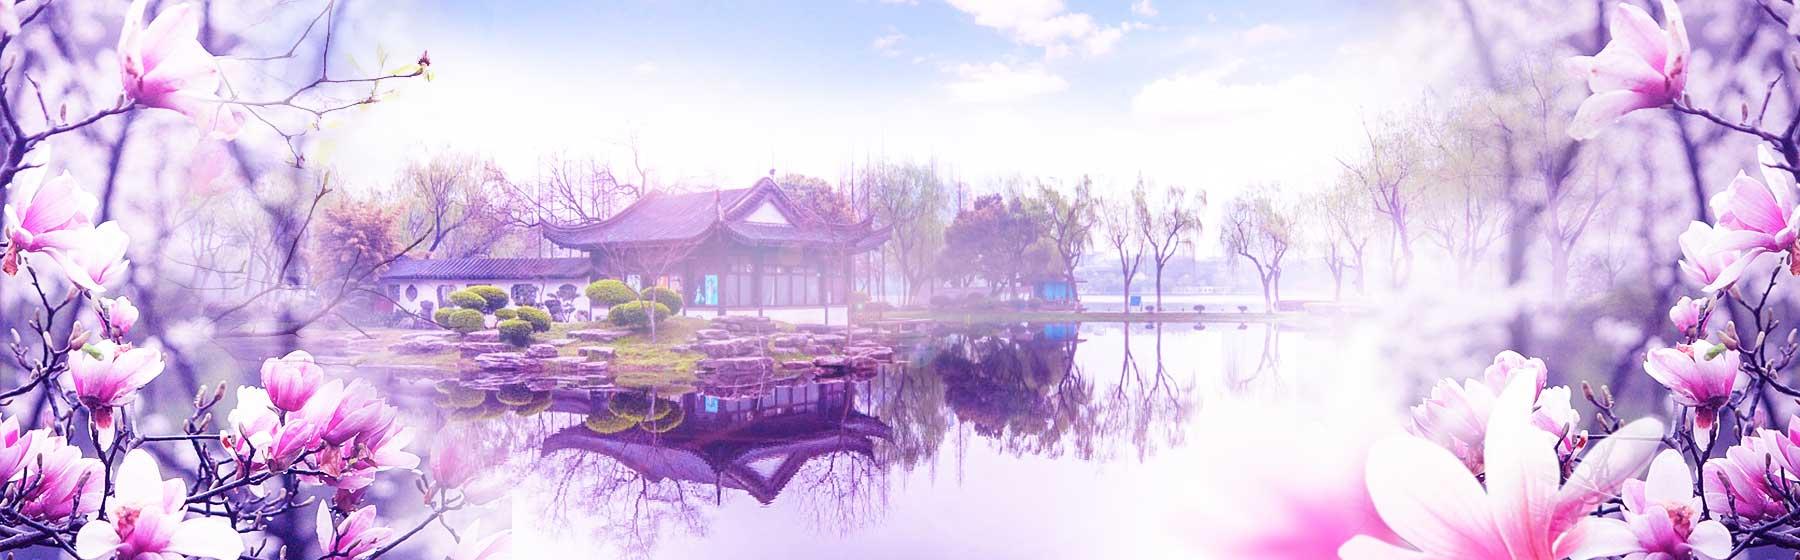 https://ru.gonanjingchina.com/sites/default/files/have-a-date-with-spring-in-nanjing-3.jpg